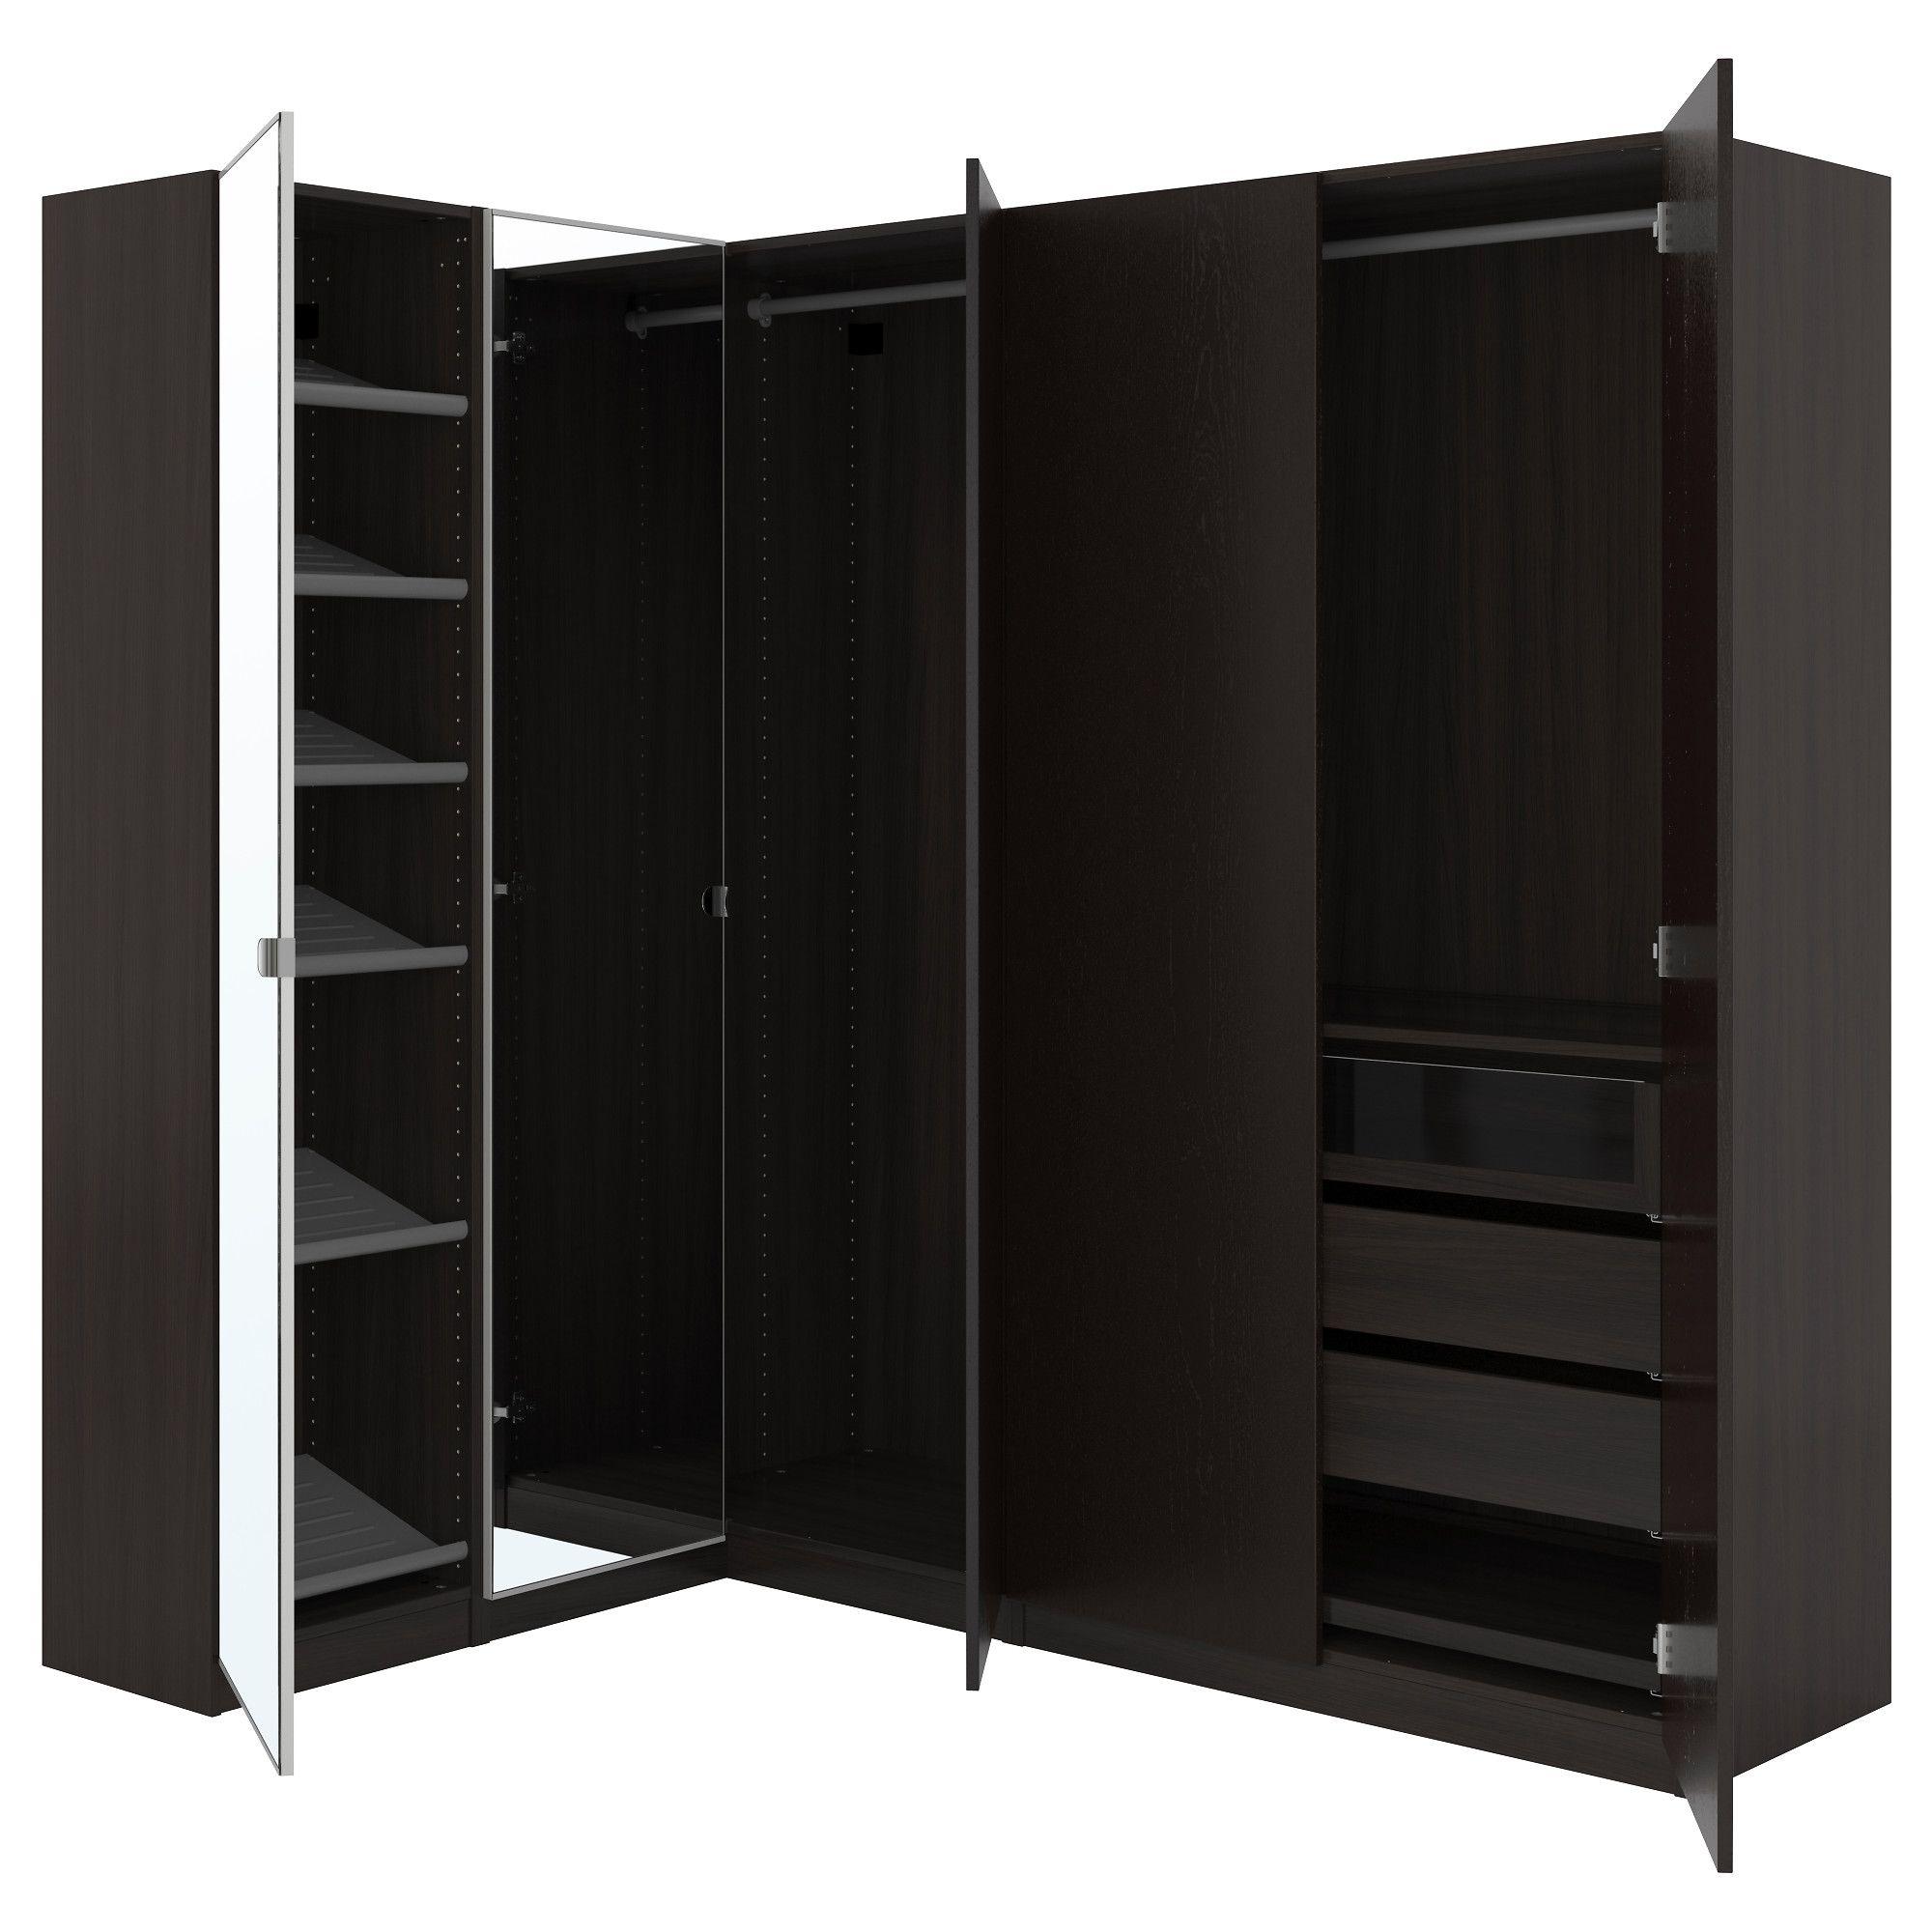 Pax Corner Wardrobe Black Brown Nexus Vikedal Corner Wardrobe  # Meuble Tv Nexus